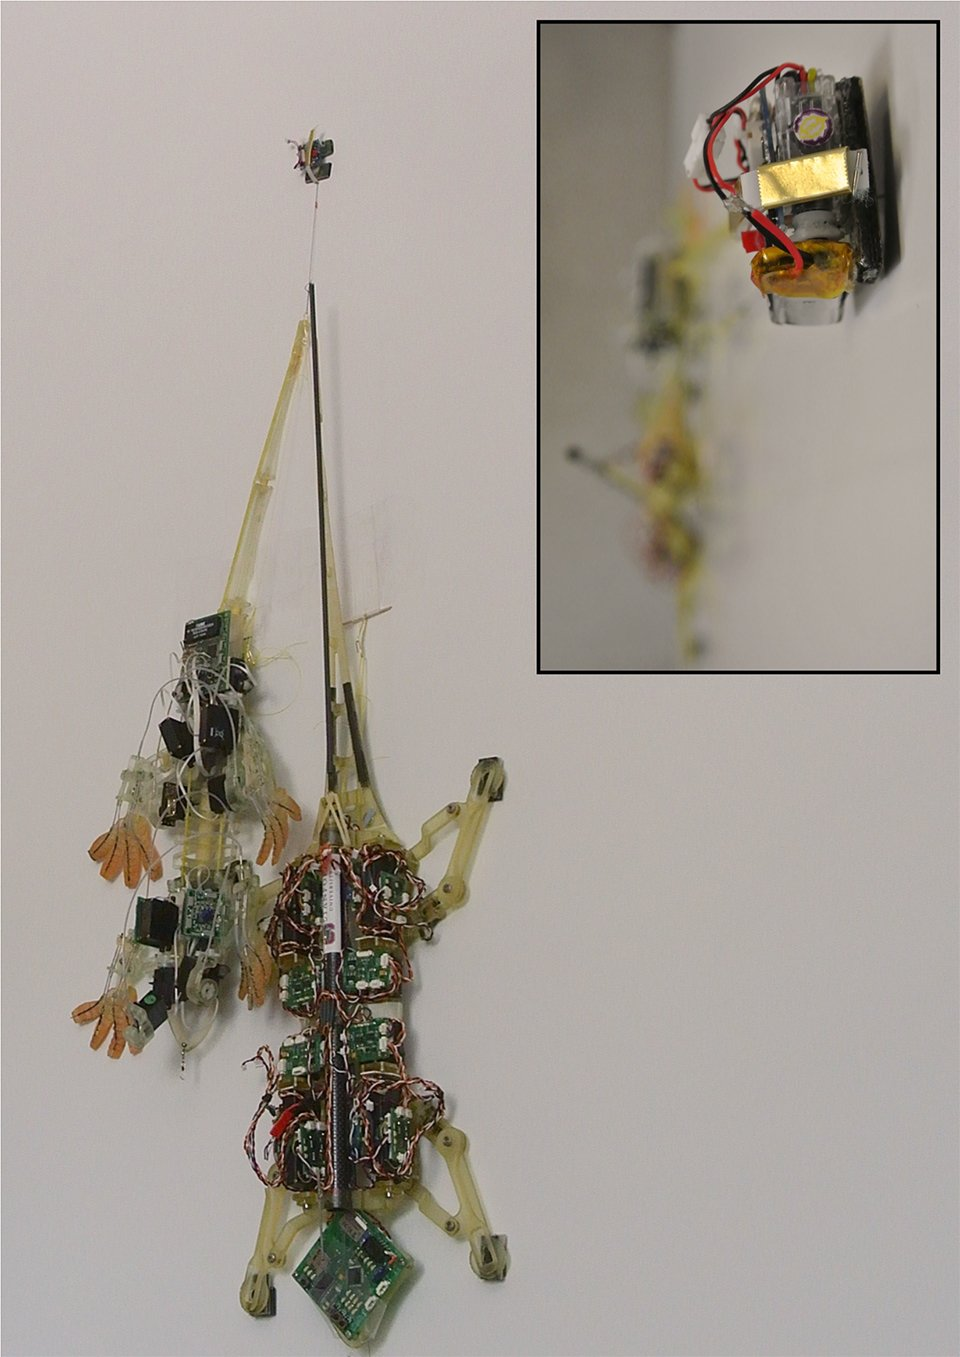 Tiny Robots with Sticky Feet Drag Heavy Loads: Atlas Tugged - Technabob